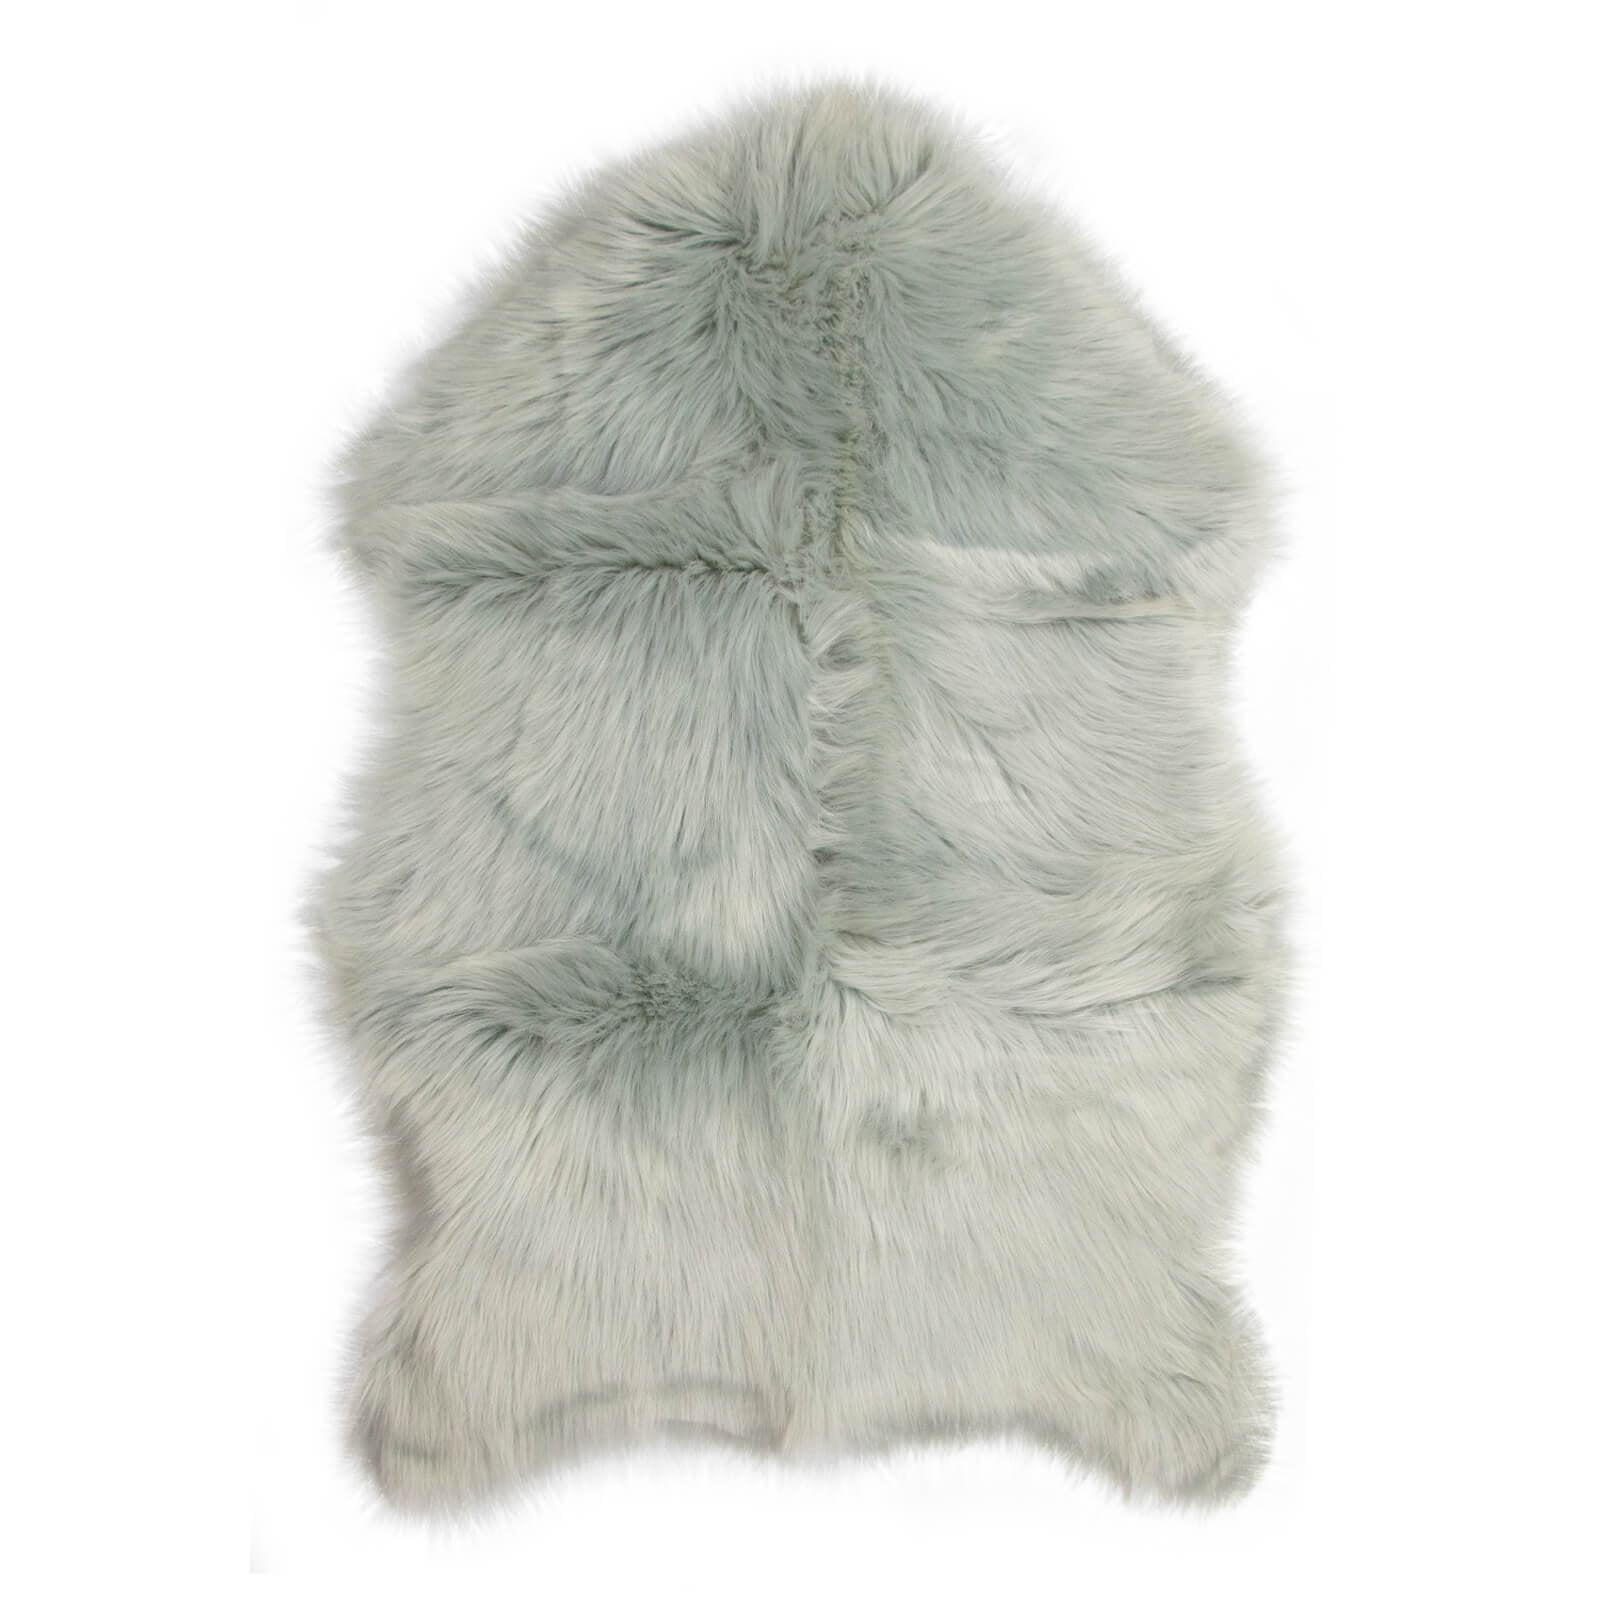 Faux Fur Sheepskin Rug – Silver, Furry